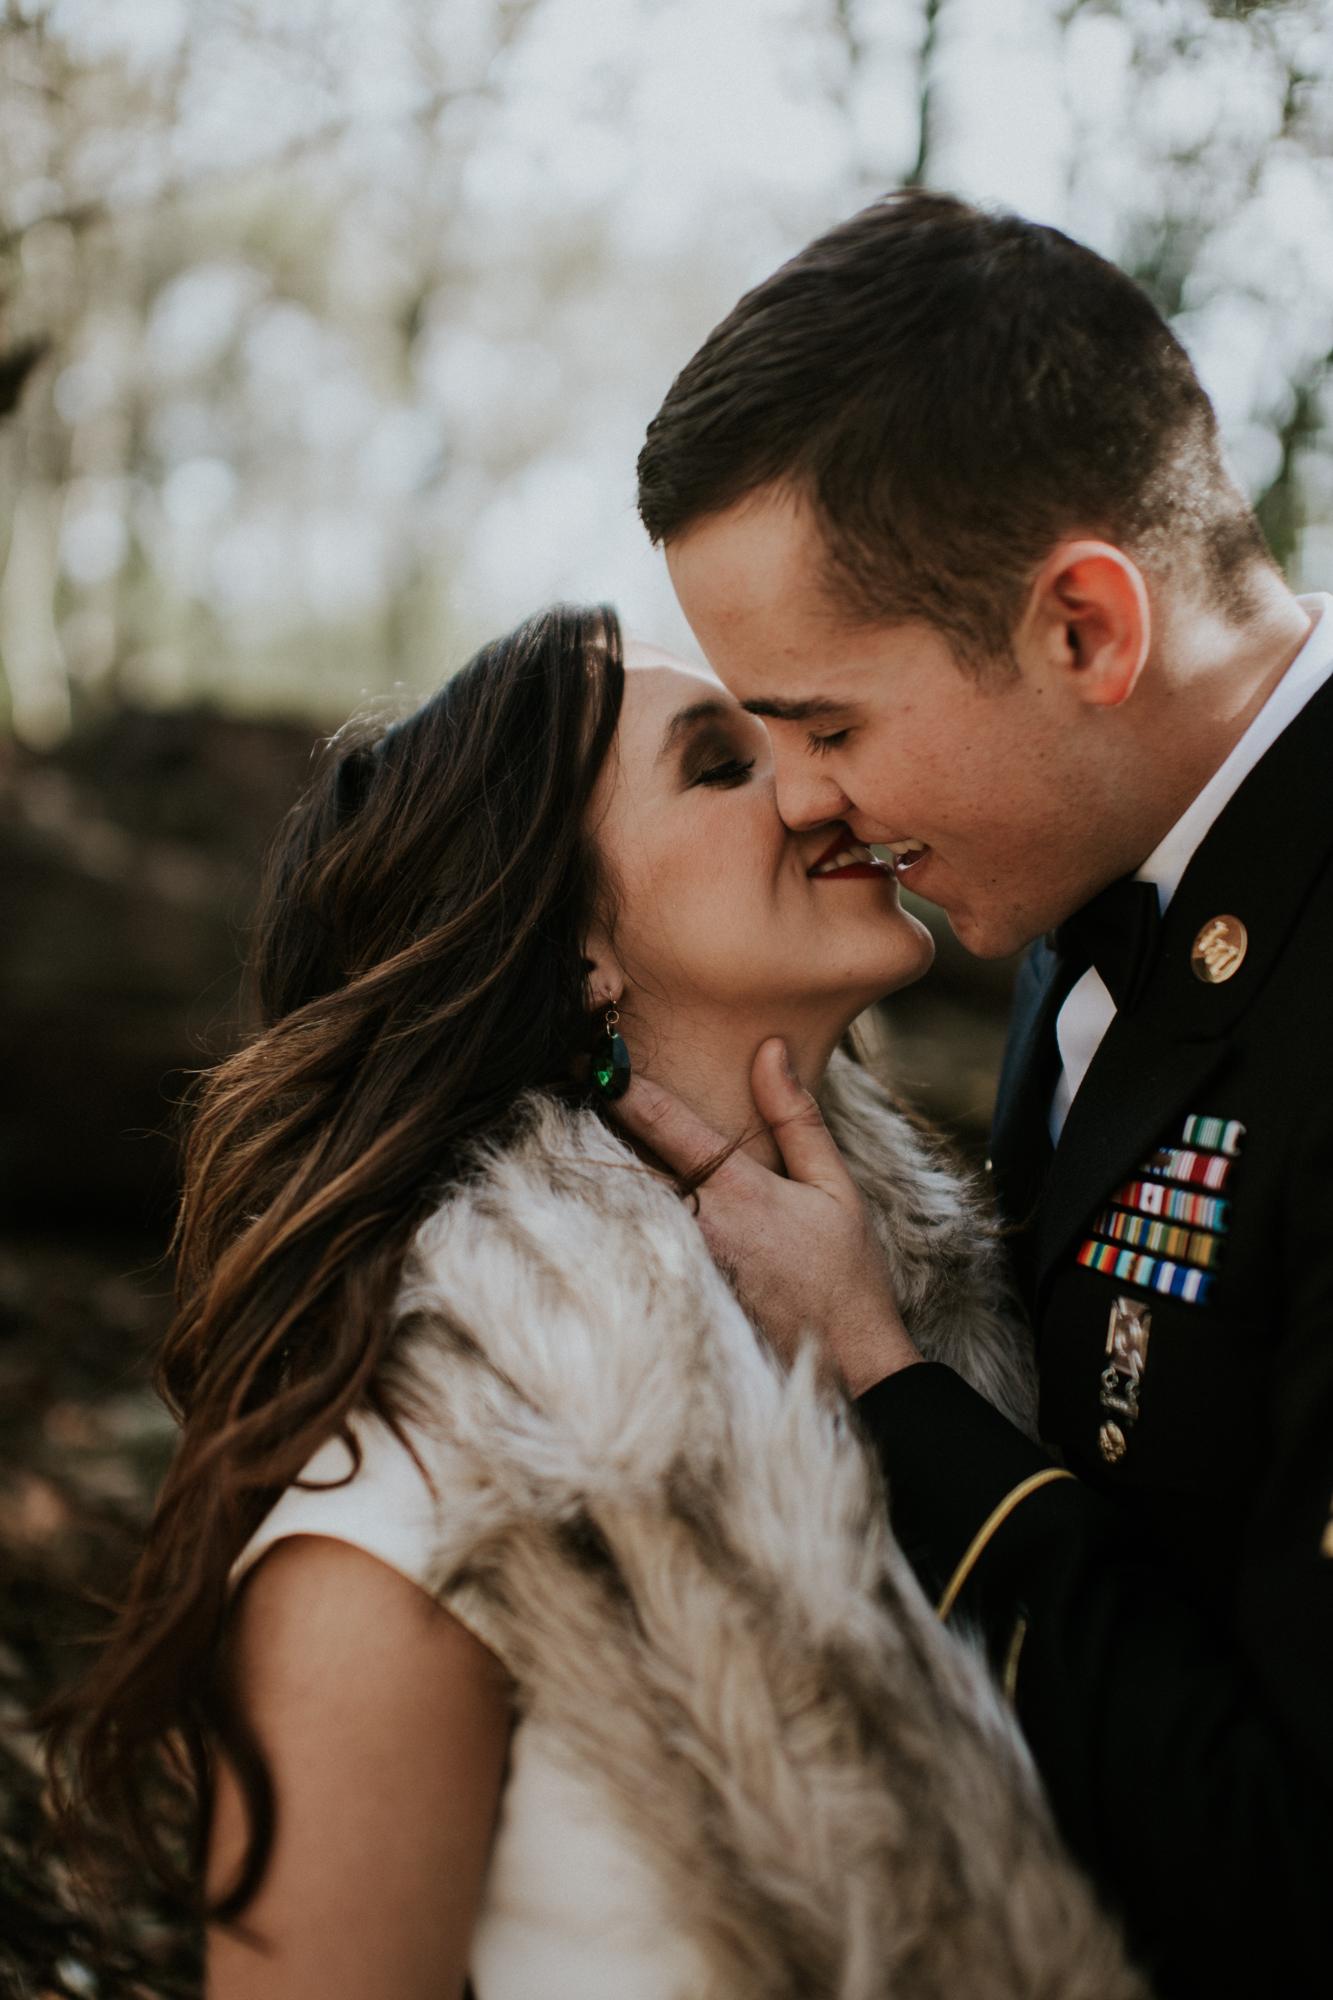 Landa Park Elopement   New Braunfels, Tx Elopement   Military Elopement   San Antonio Wedding